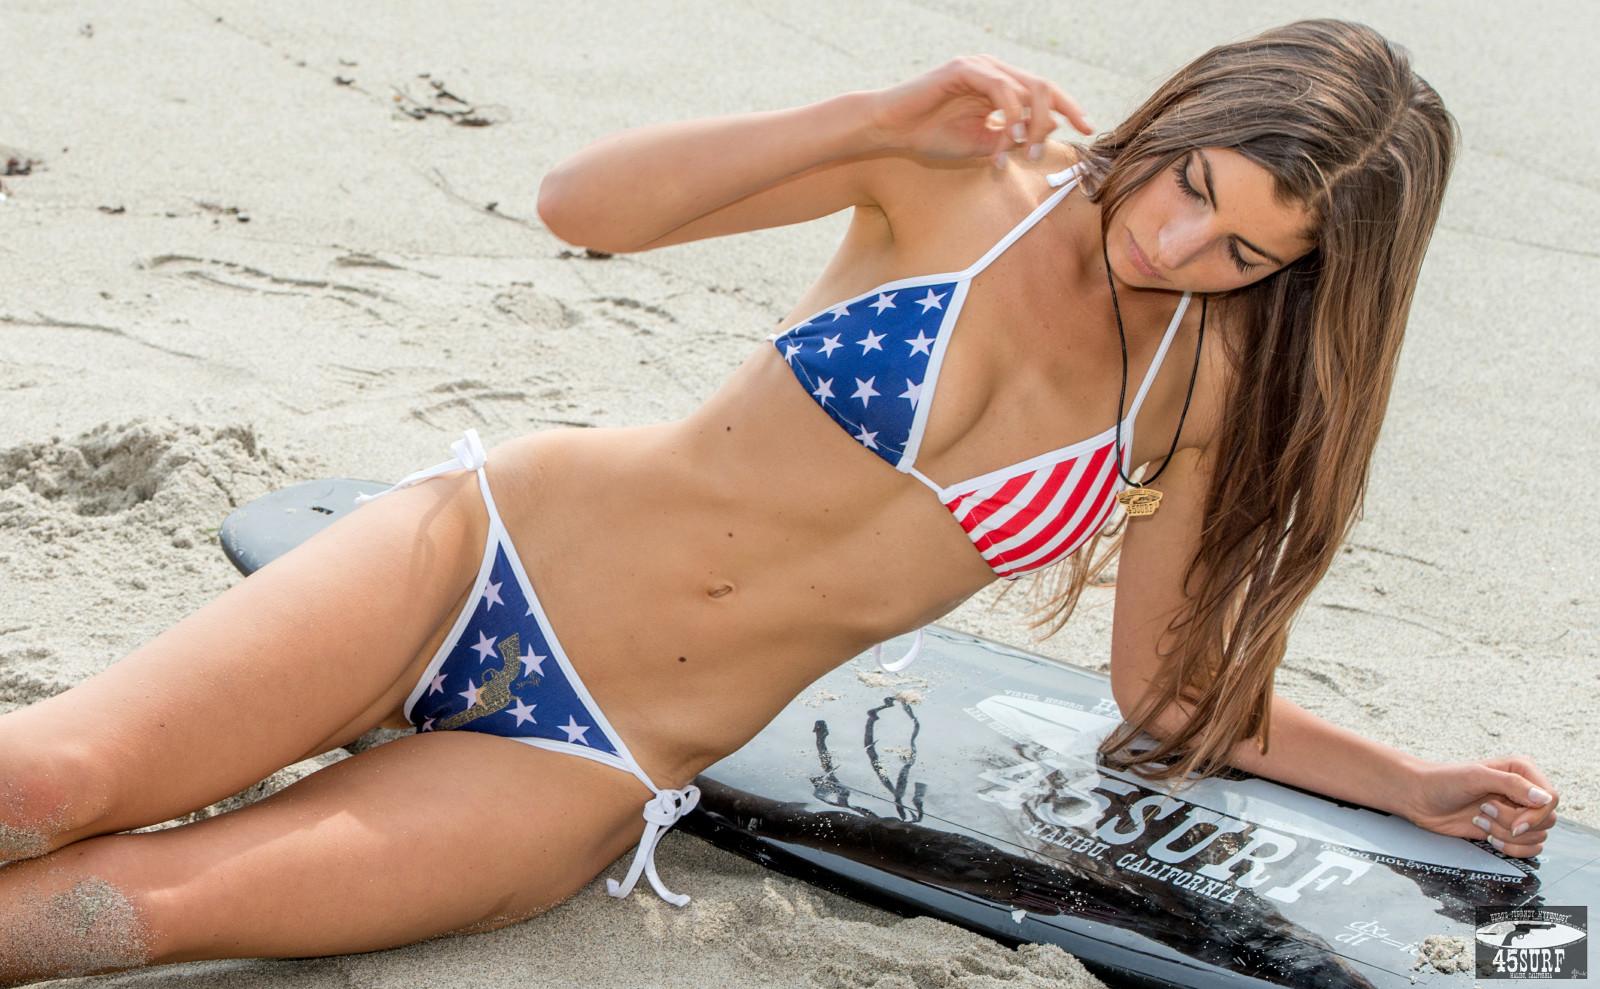 Pretty Girl Wallpaper Full Hd Wallpaper Pictures California Girls Sea Woman Brown